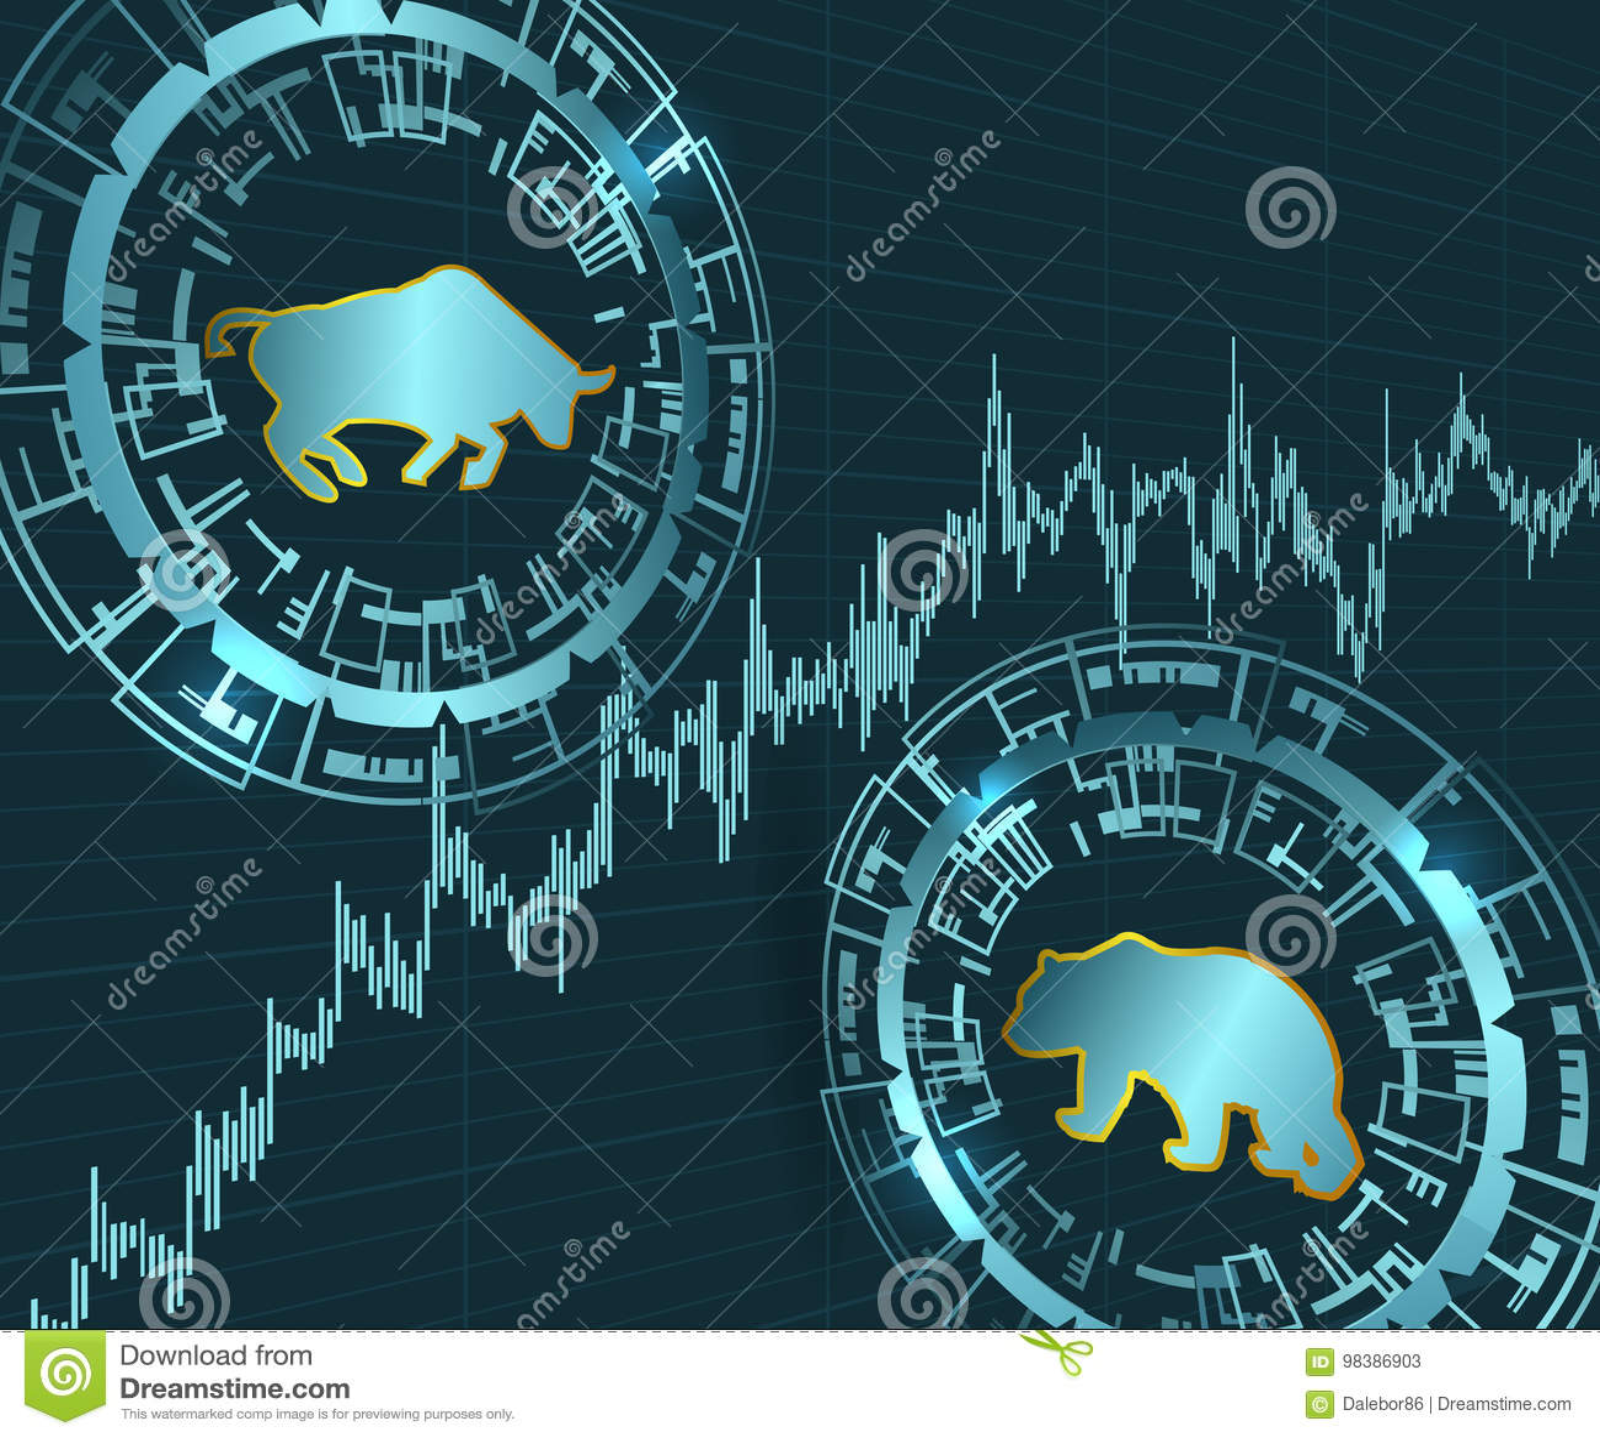 Bull and bear symbols and price chart stock vector illustration bull and bear symbols and price chartdern stock exchange concept buycottarizona Gallery